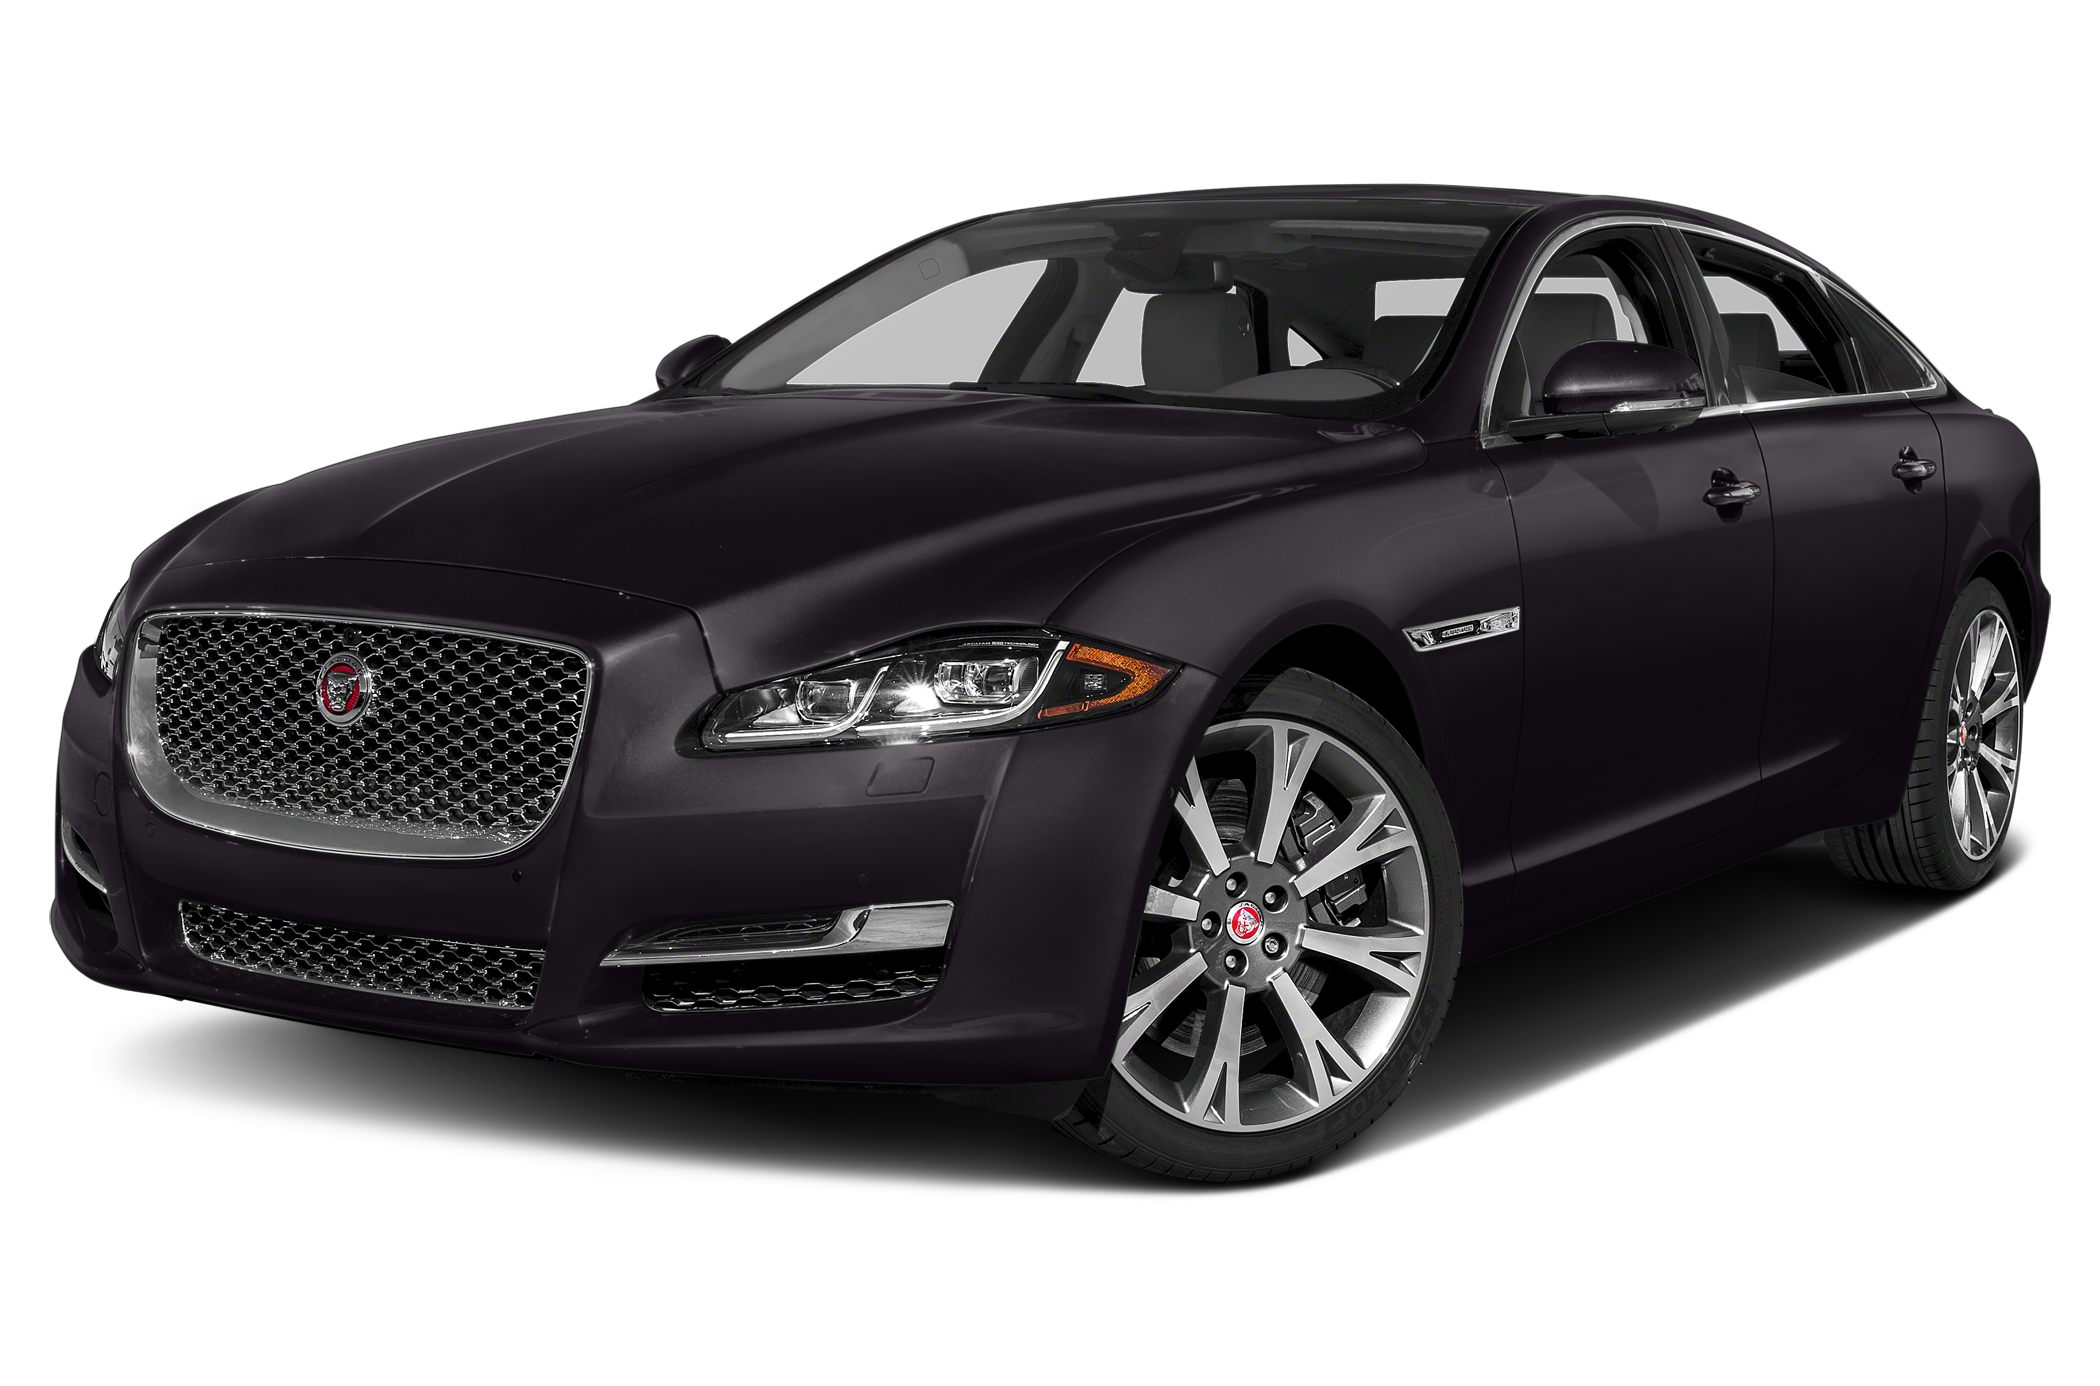 xjl models all wheelbase price long supercharged xj usa jaguar